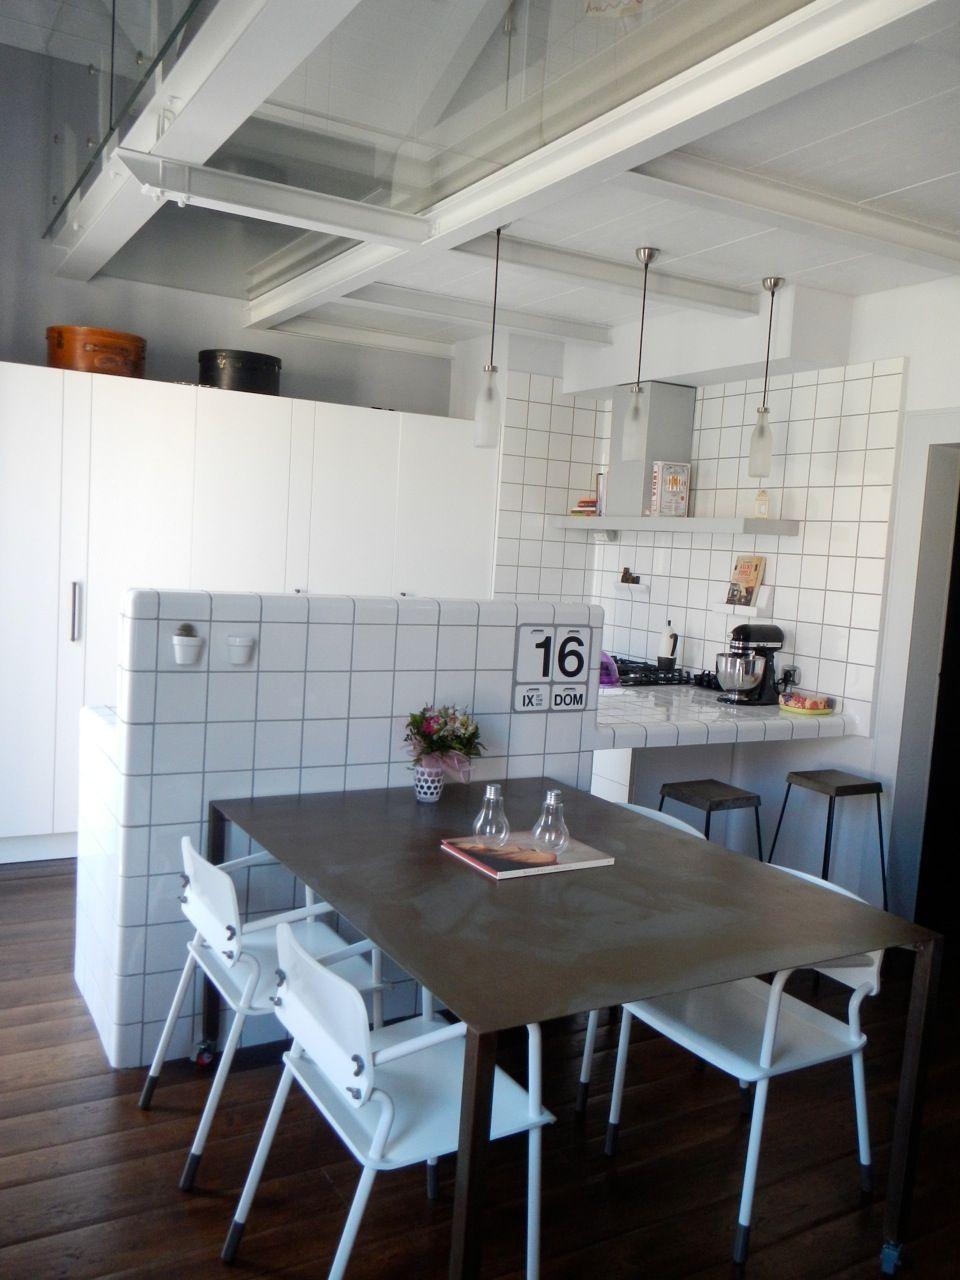 Openhouse barcelona shop gallery magazine tiles amsterdam for Openhouse barcelona